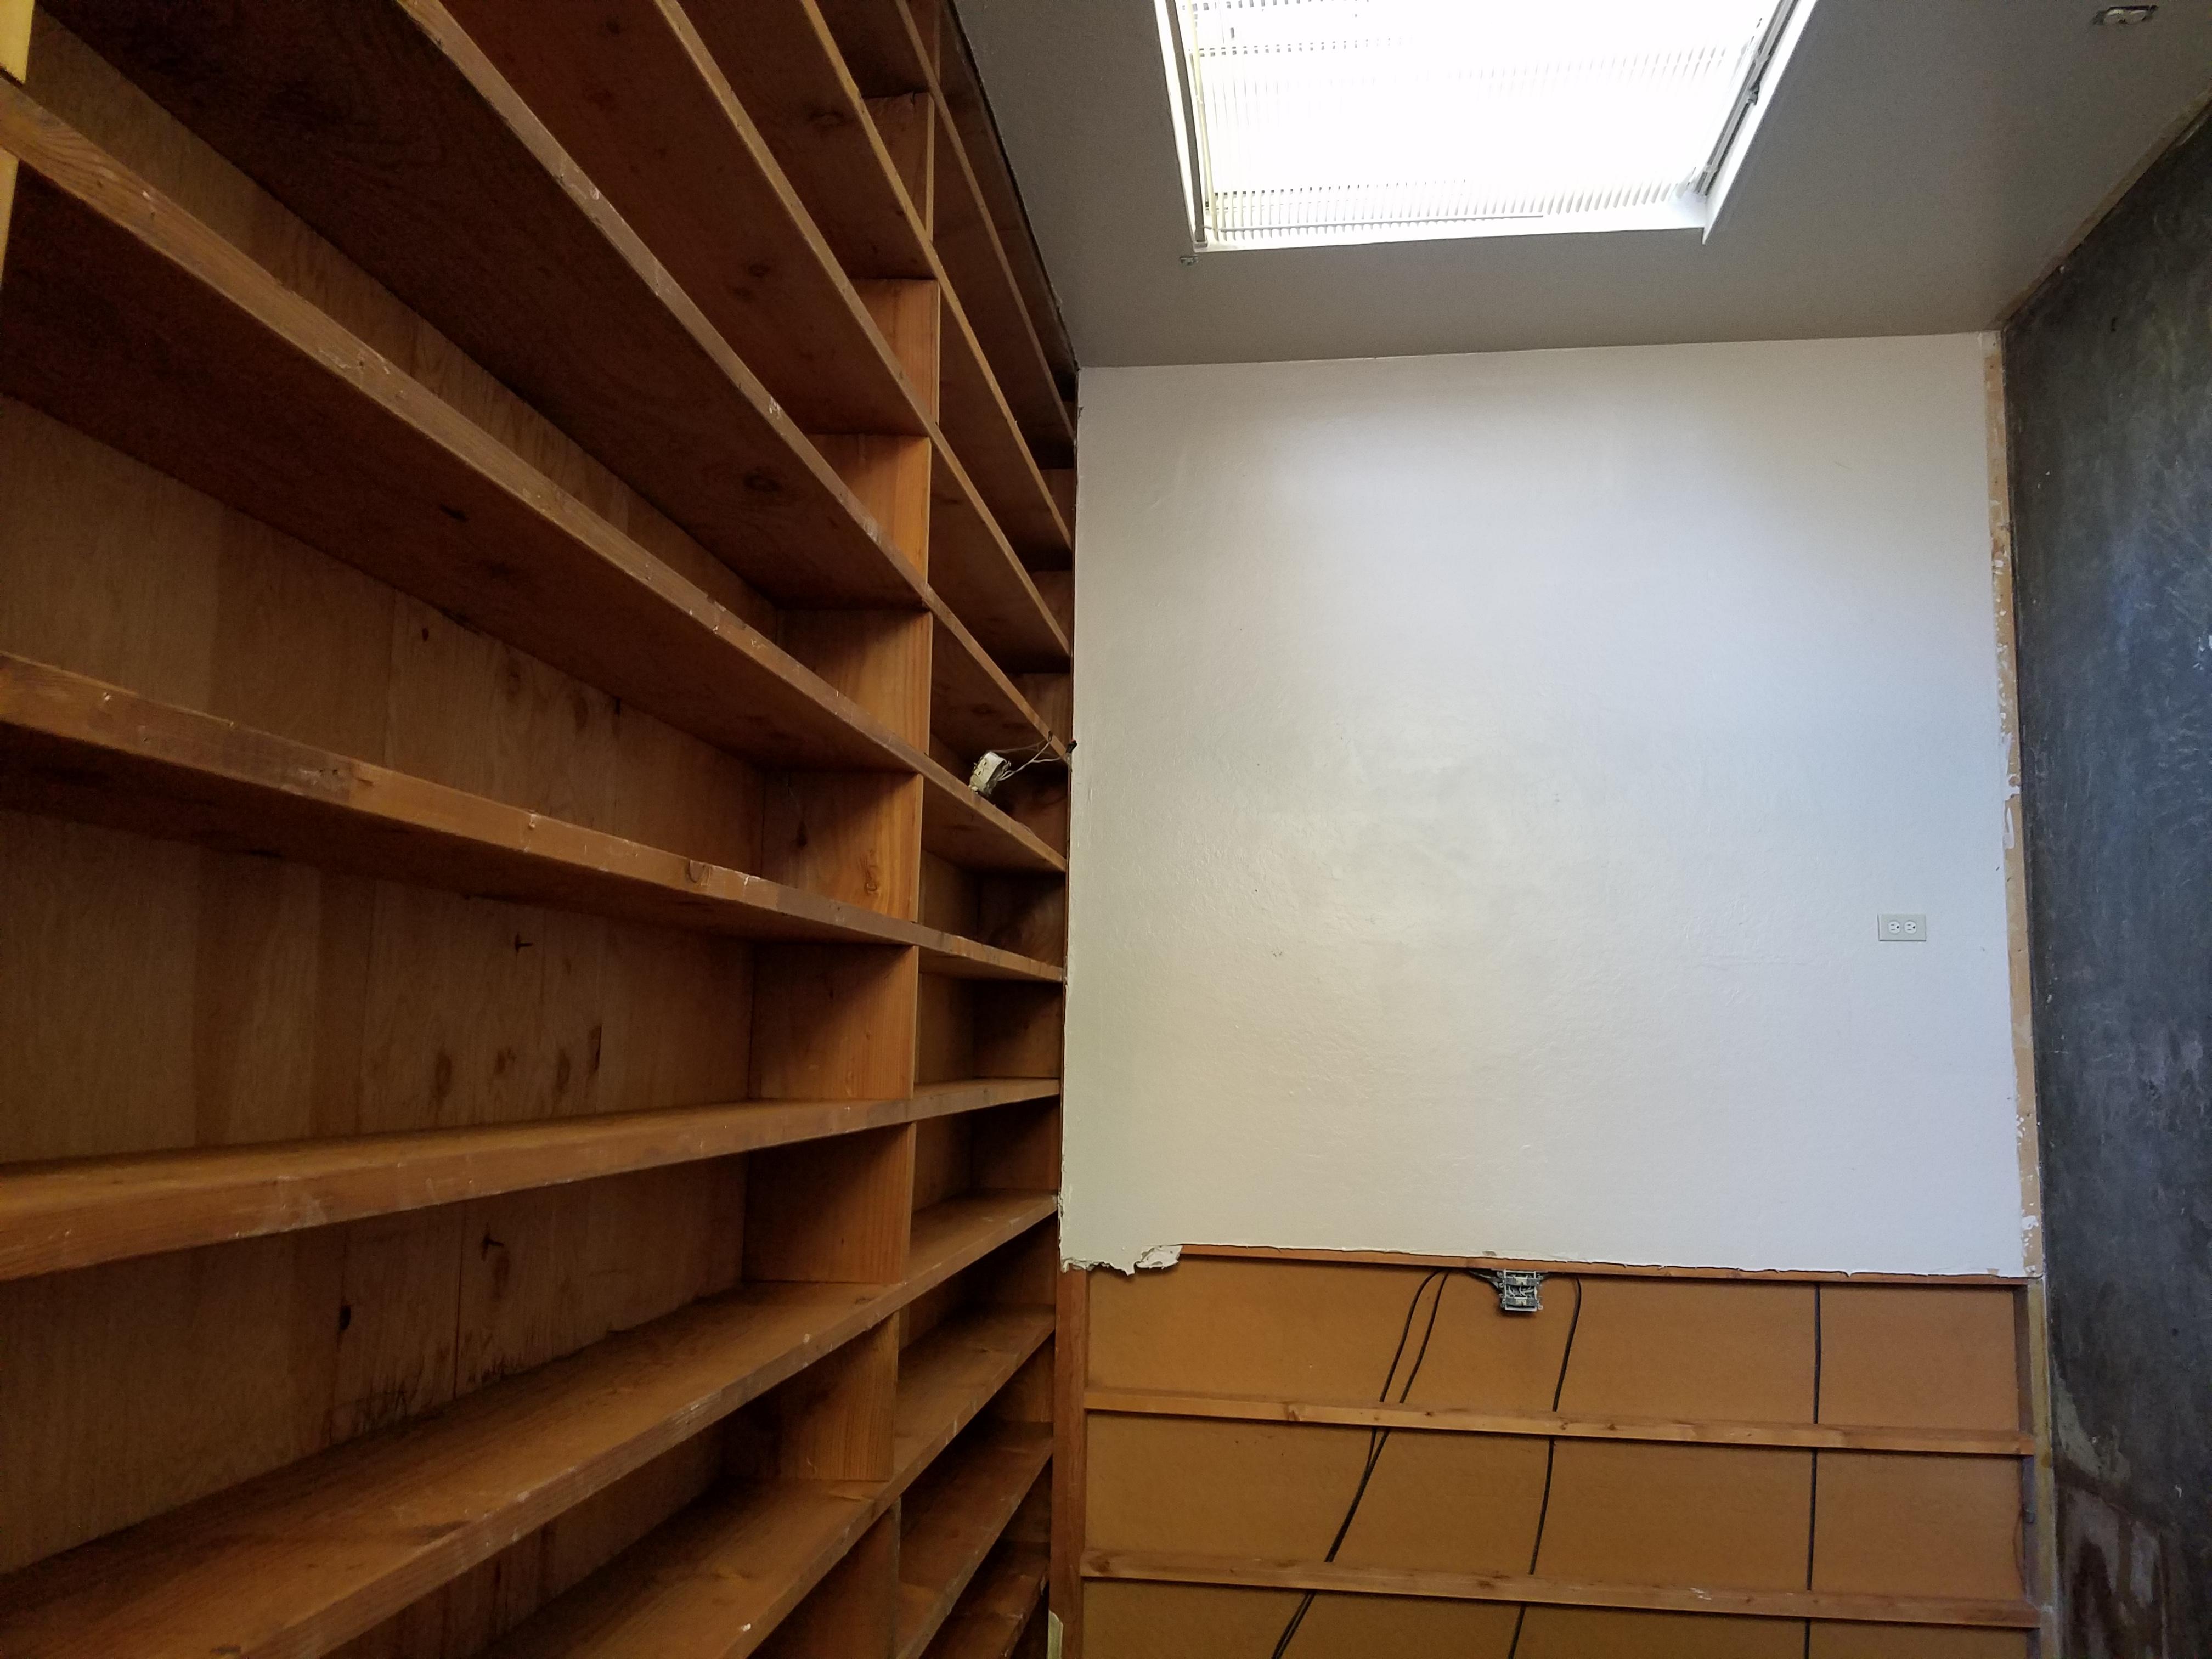 Insulation between floors (Should i insulate?)-20170815_171142.jpg